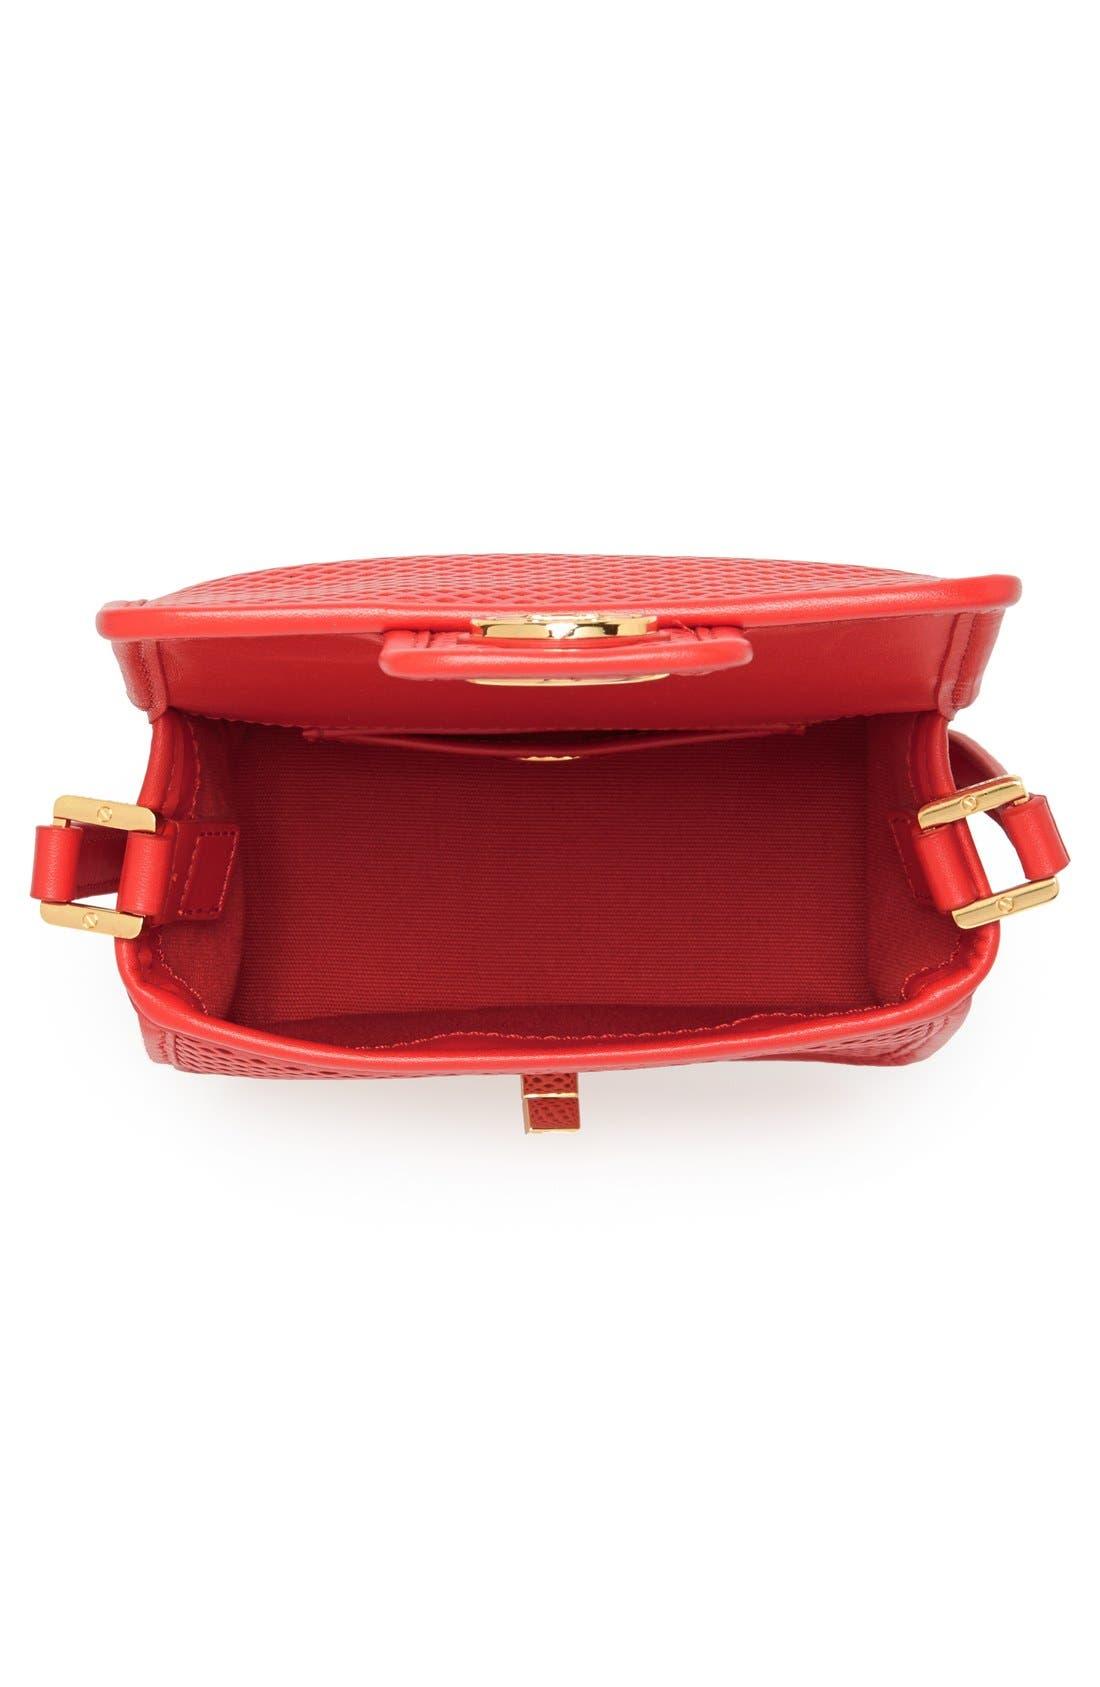 Alternate Image 3  - Tory Burch 'Mini Harper' Leather Crossbody Bag